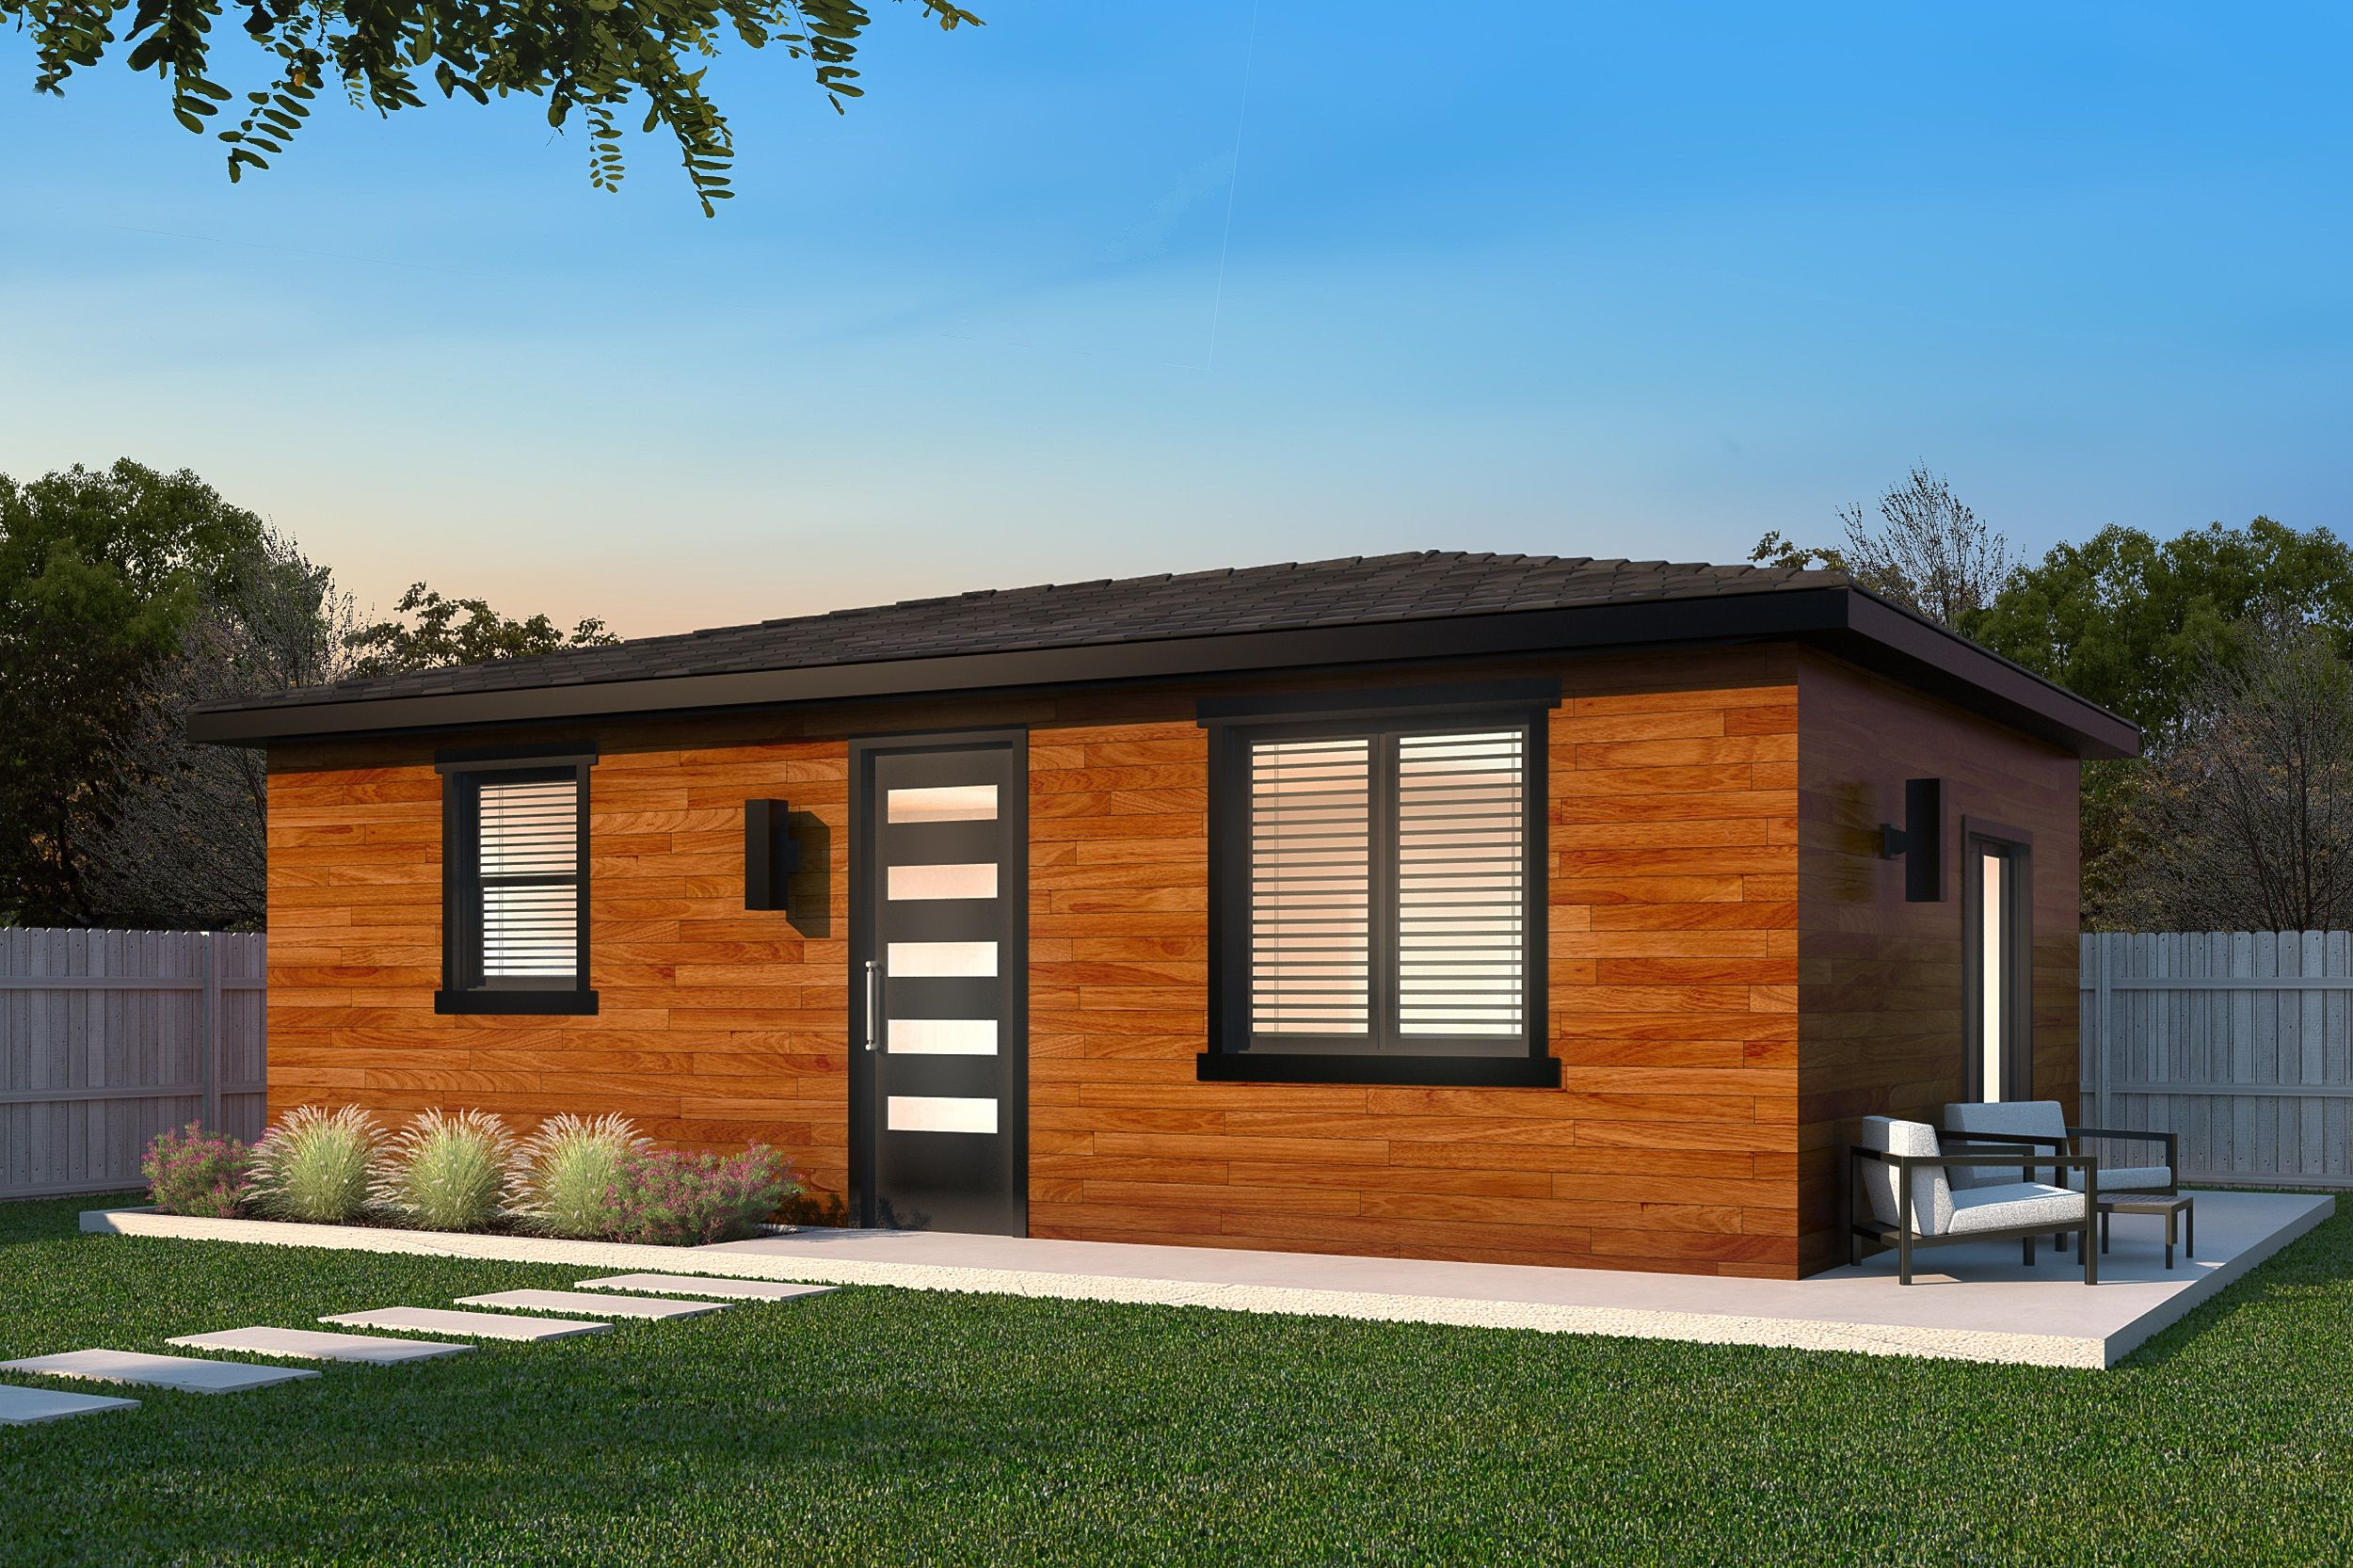 The Irvine 600 square feet 1 Bedroom, 1 Bathroom